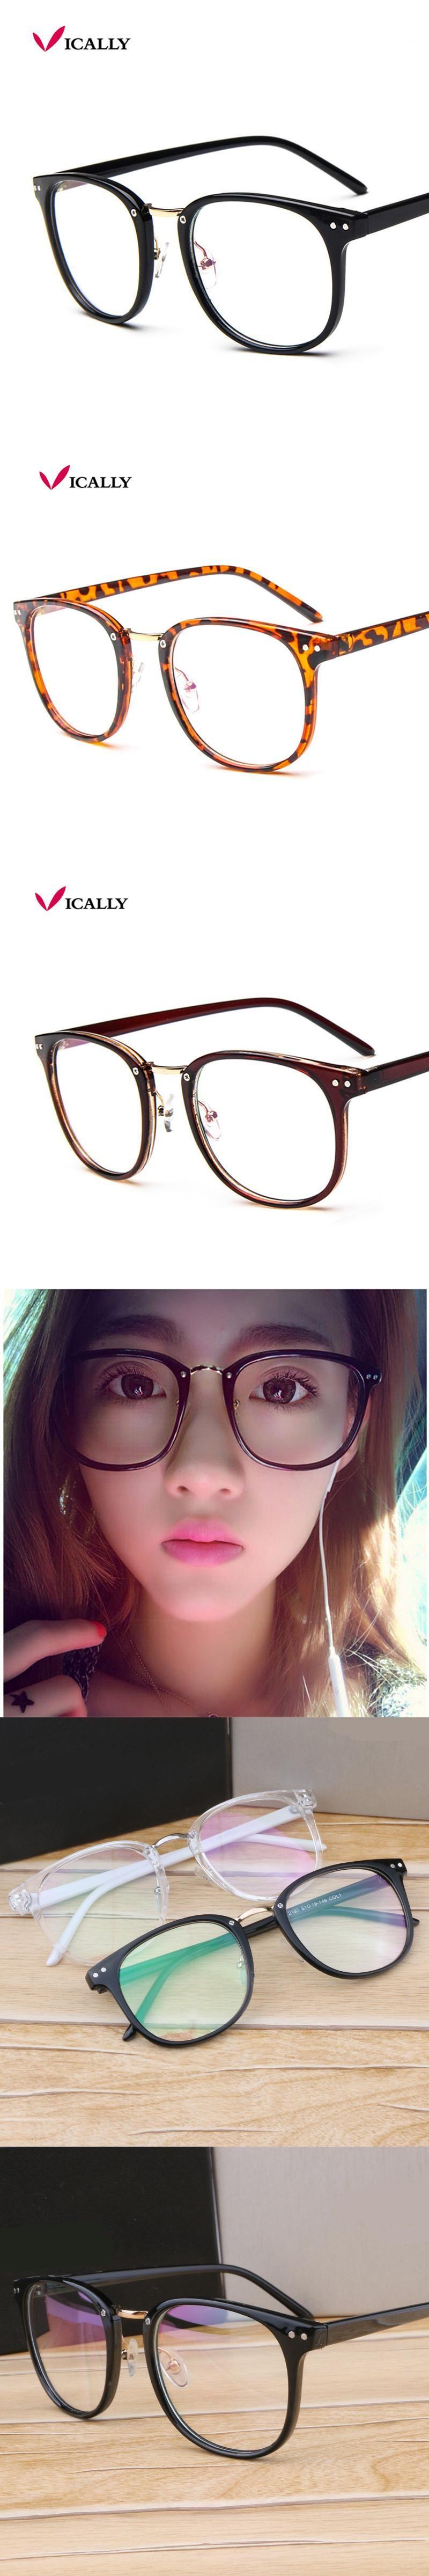 714da137d44 Metal Leg Vintage Eyeglasses Frame Newest Oversize Glasses Frames Women Men  Fake Plain Glasses Fashion Eyewear